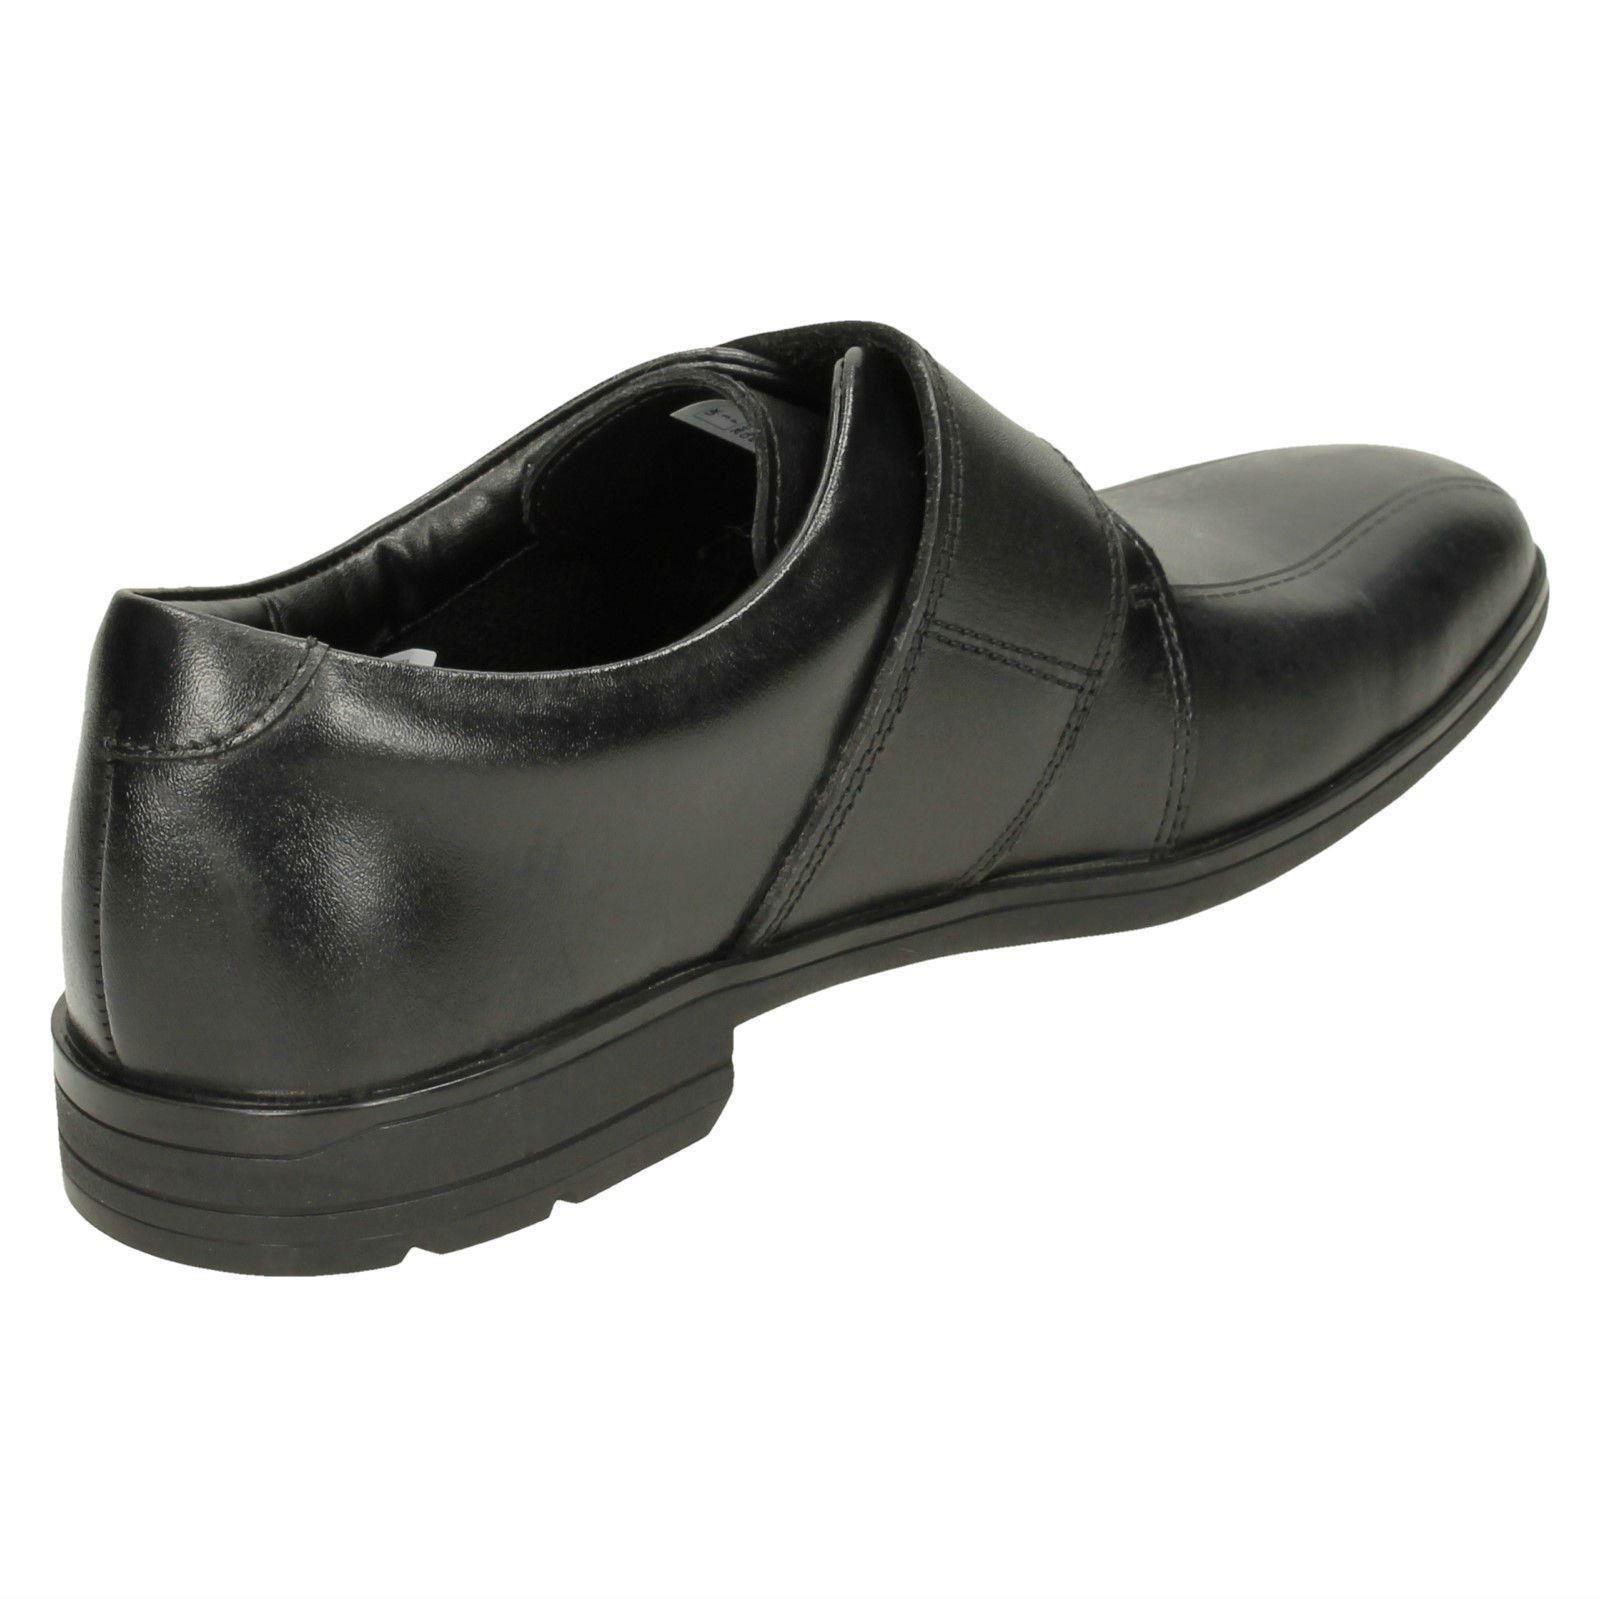 BNIB Clarks Bootleg Boys Willis Time Black Leather School Shoes